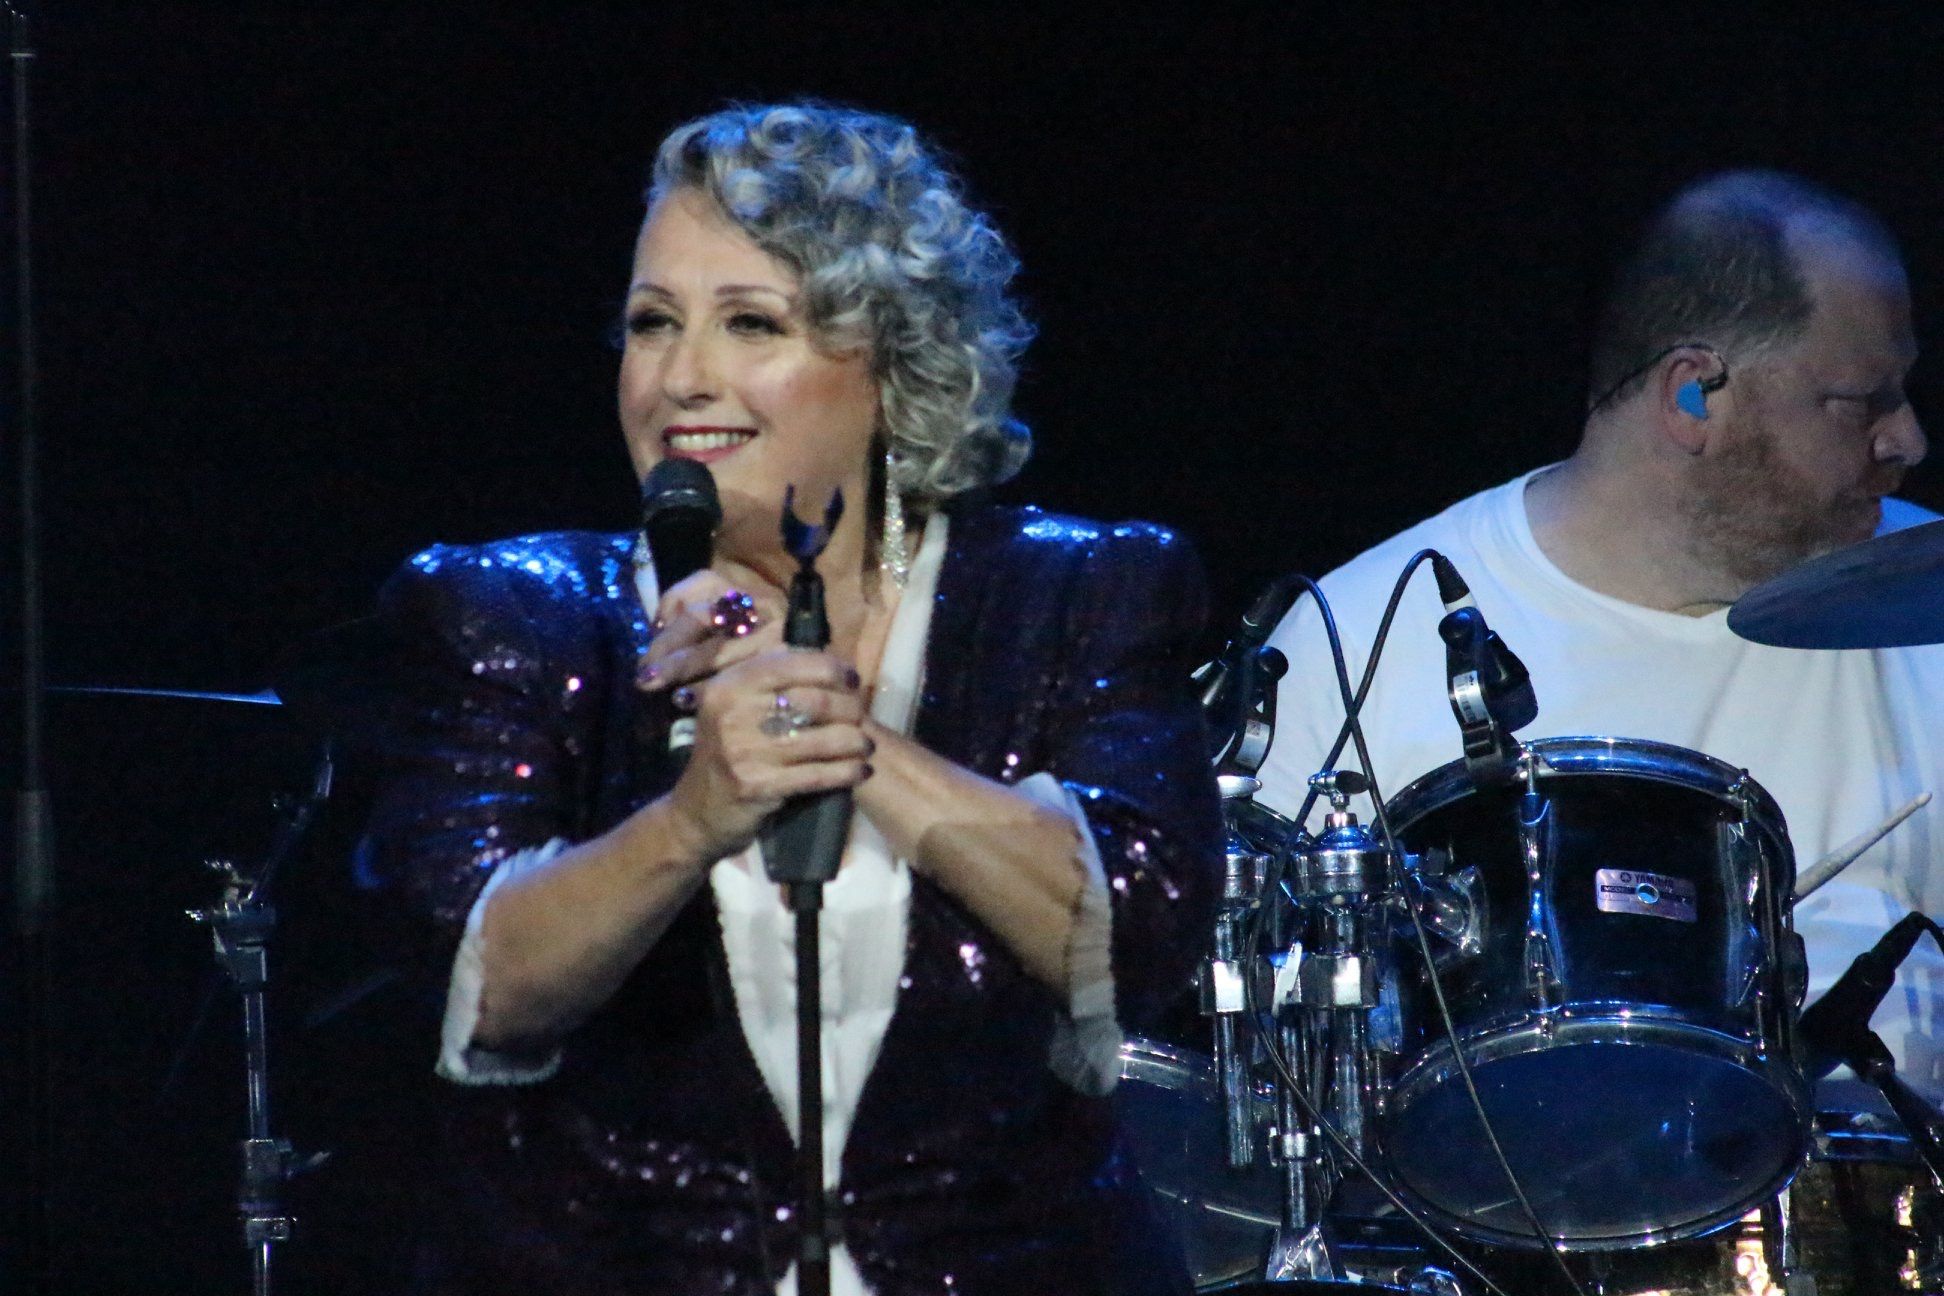 The Aretha Franklin Songbook staring Shauna Jensen